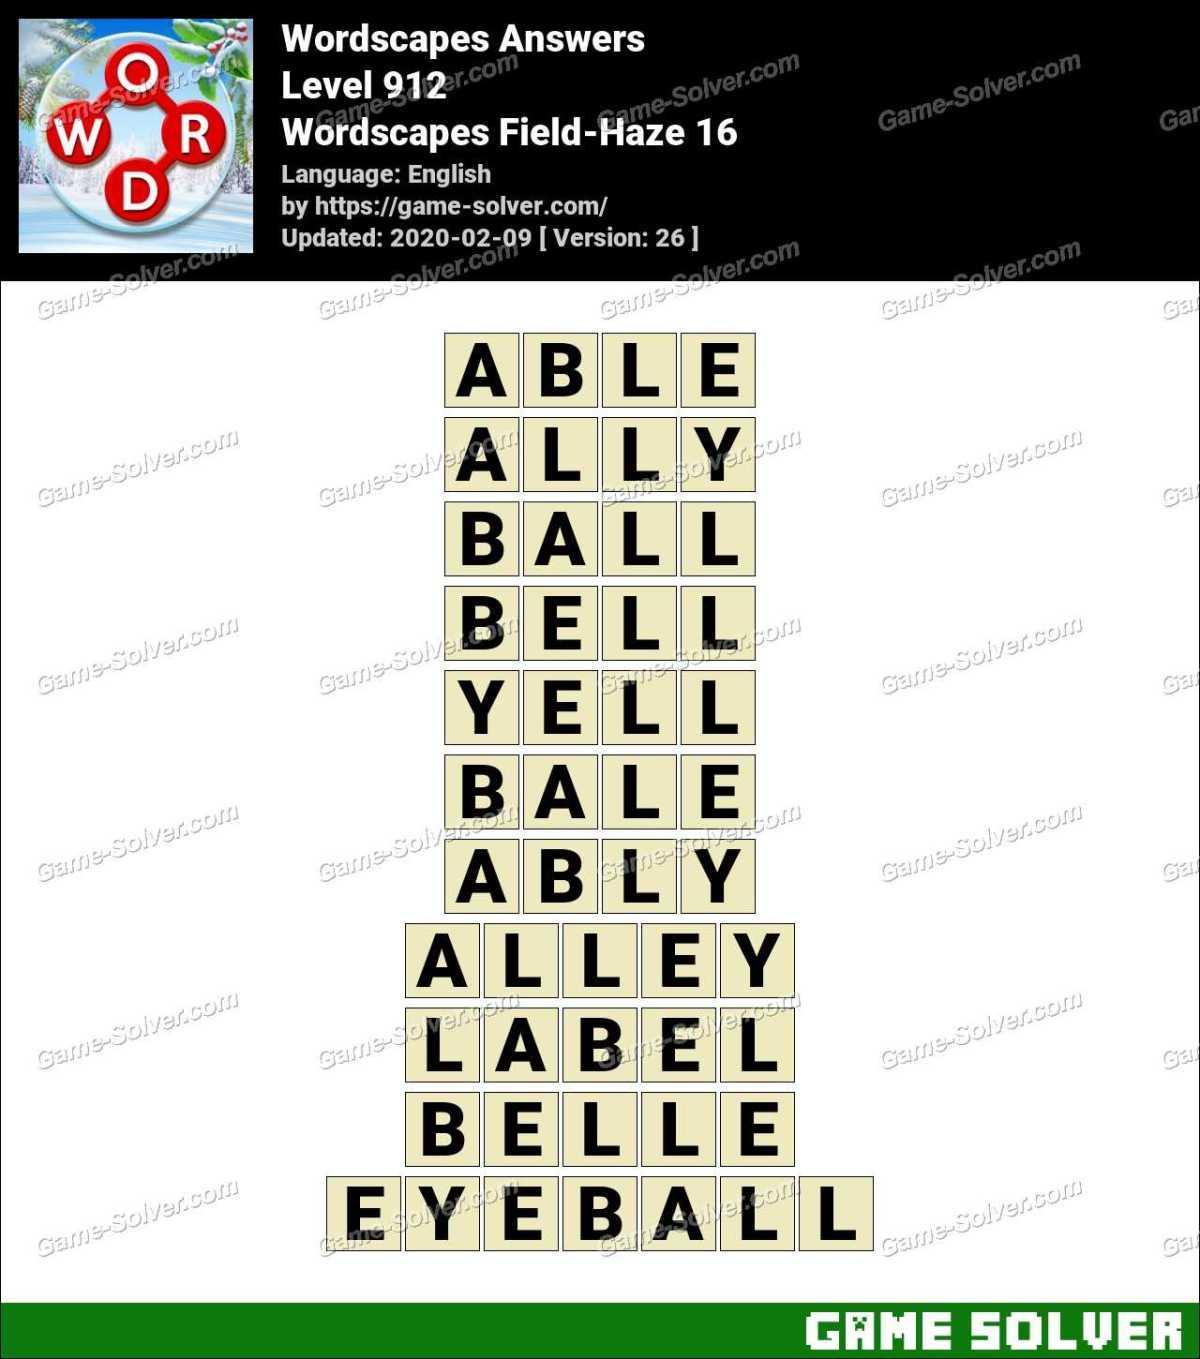 Wordscapes Field-Haze 16 Answers